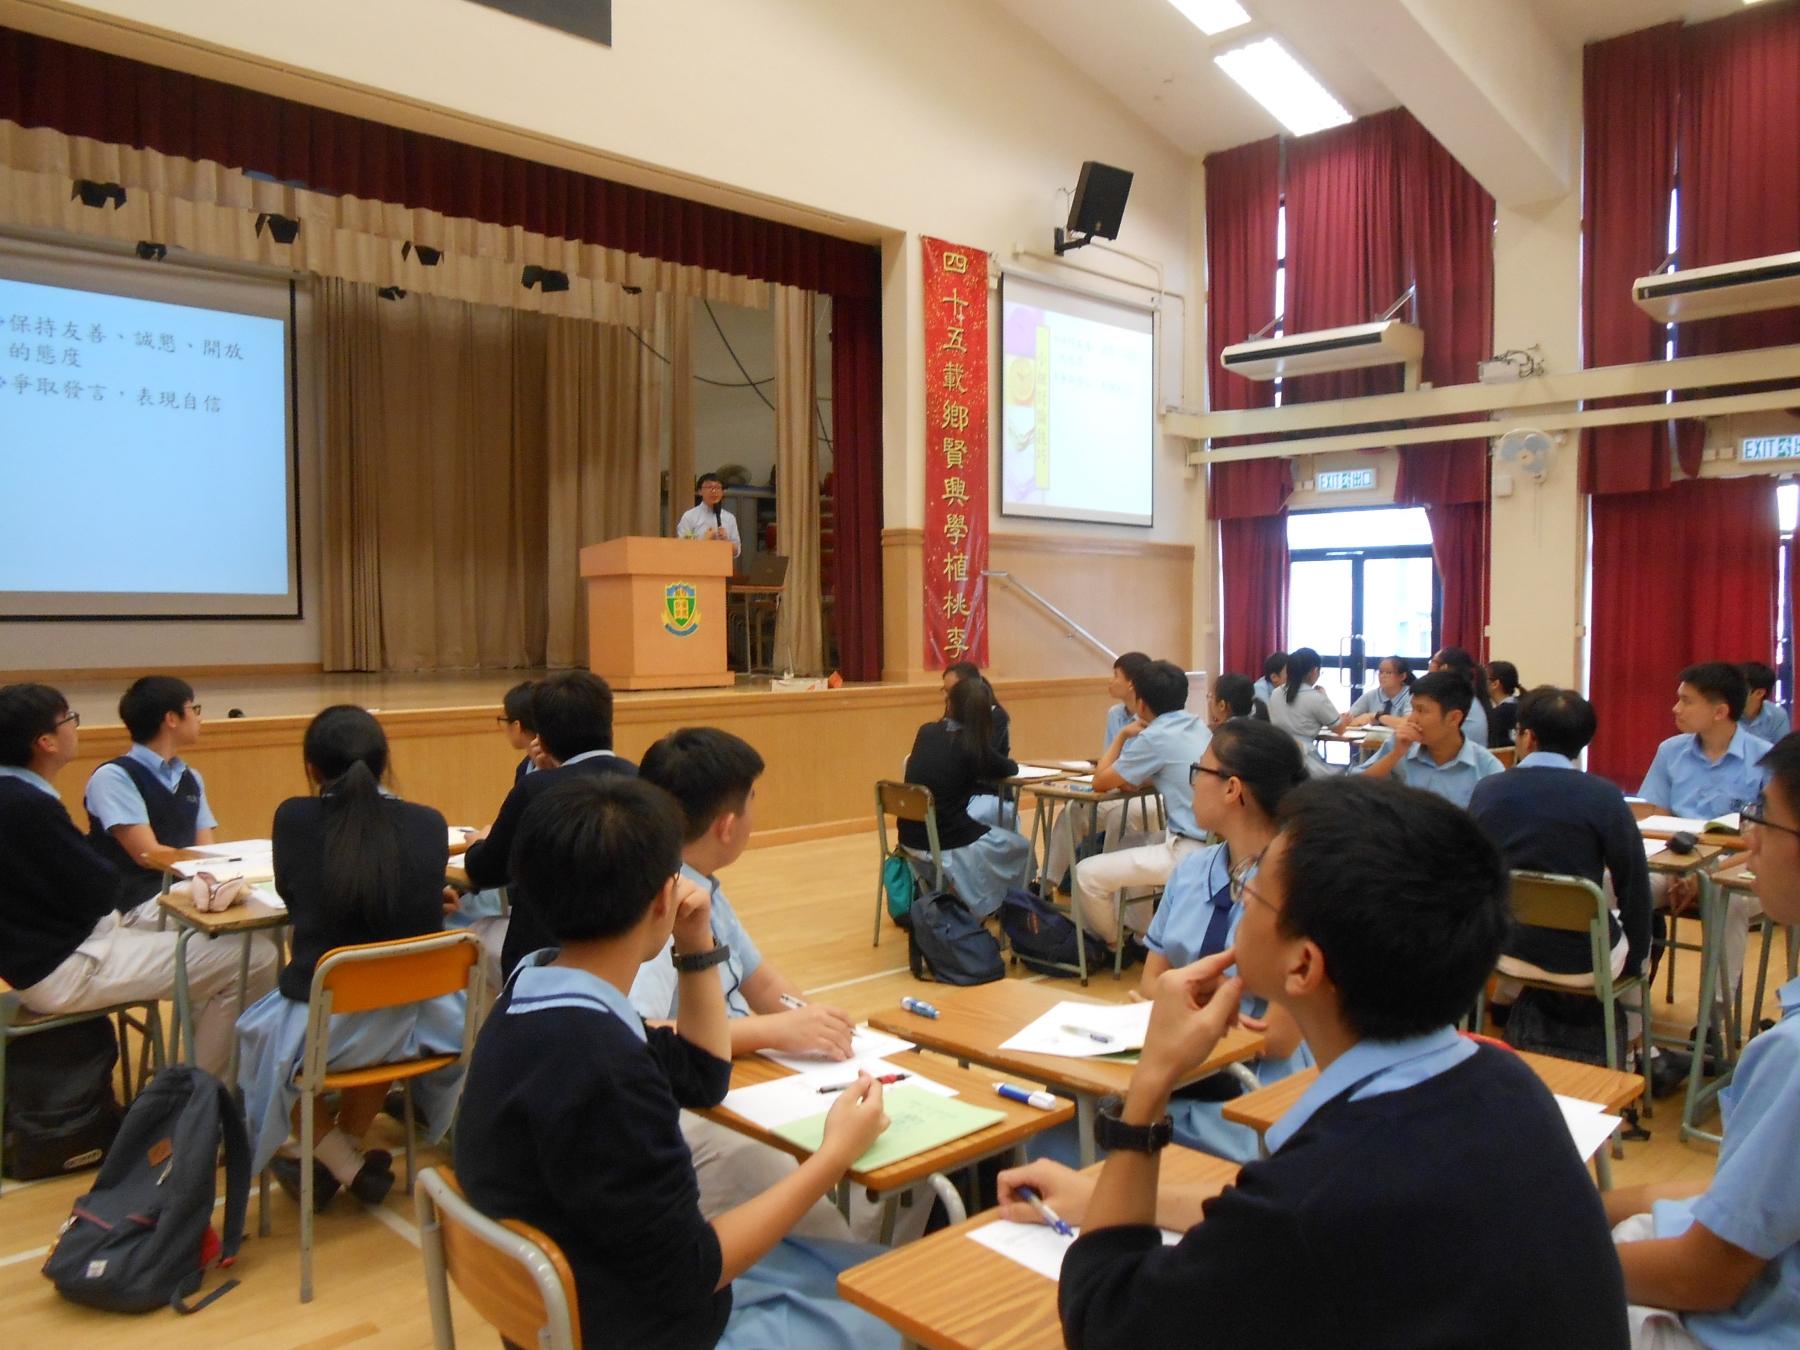 http://www.npc.edu.hk/sites/default/files/dscn8896.jpg